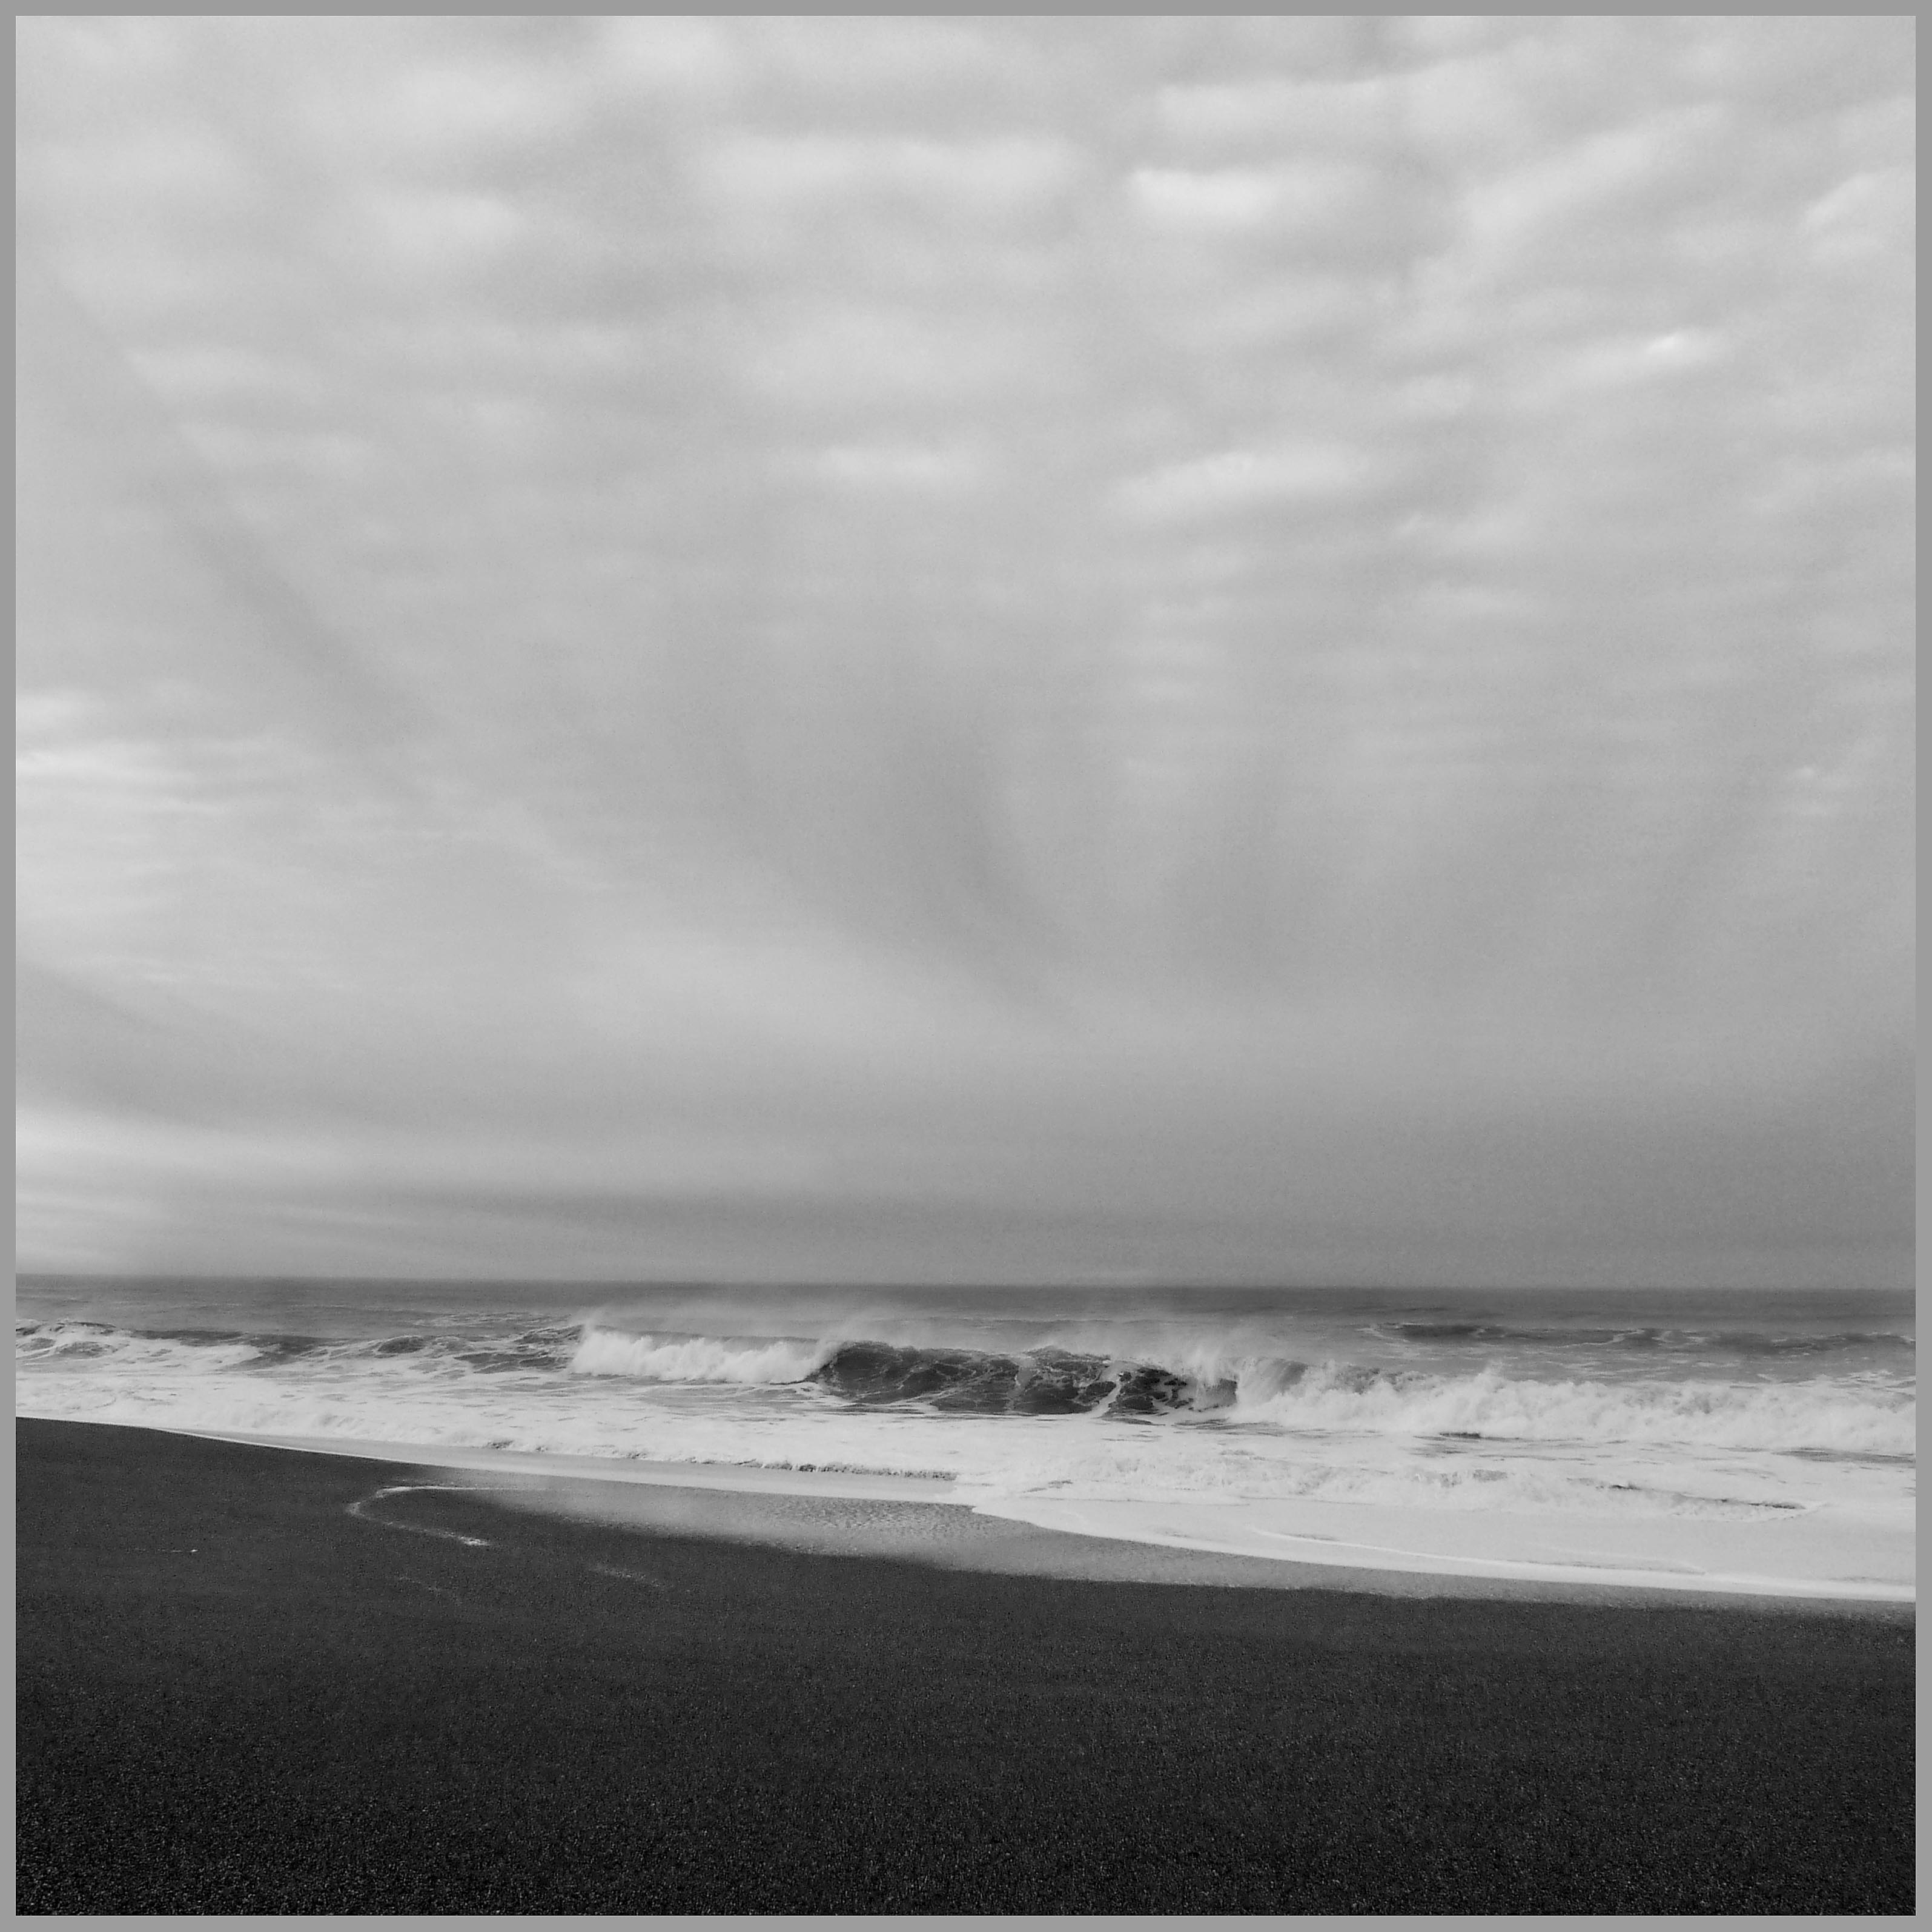 Wavess_sky_bw_1